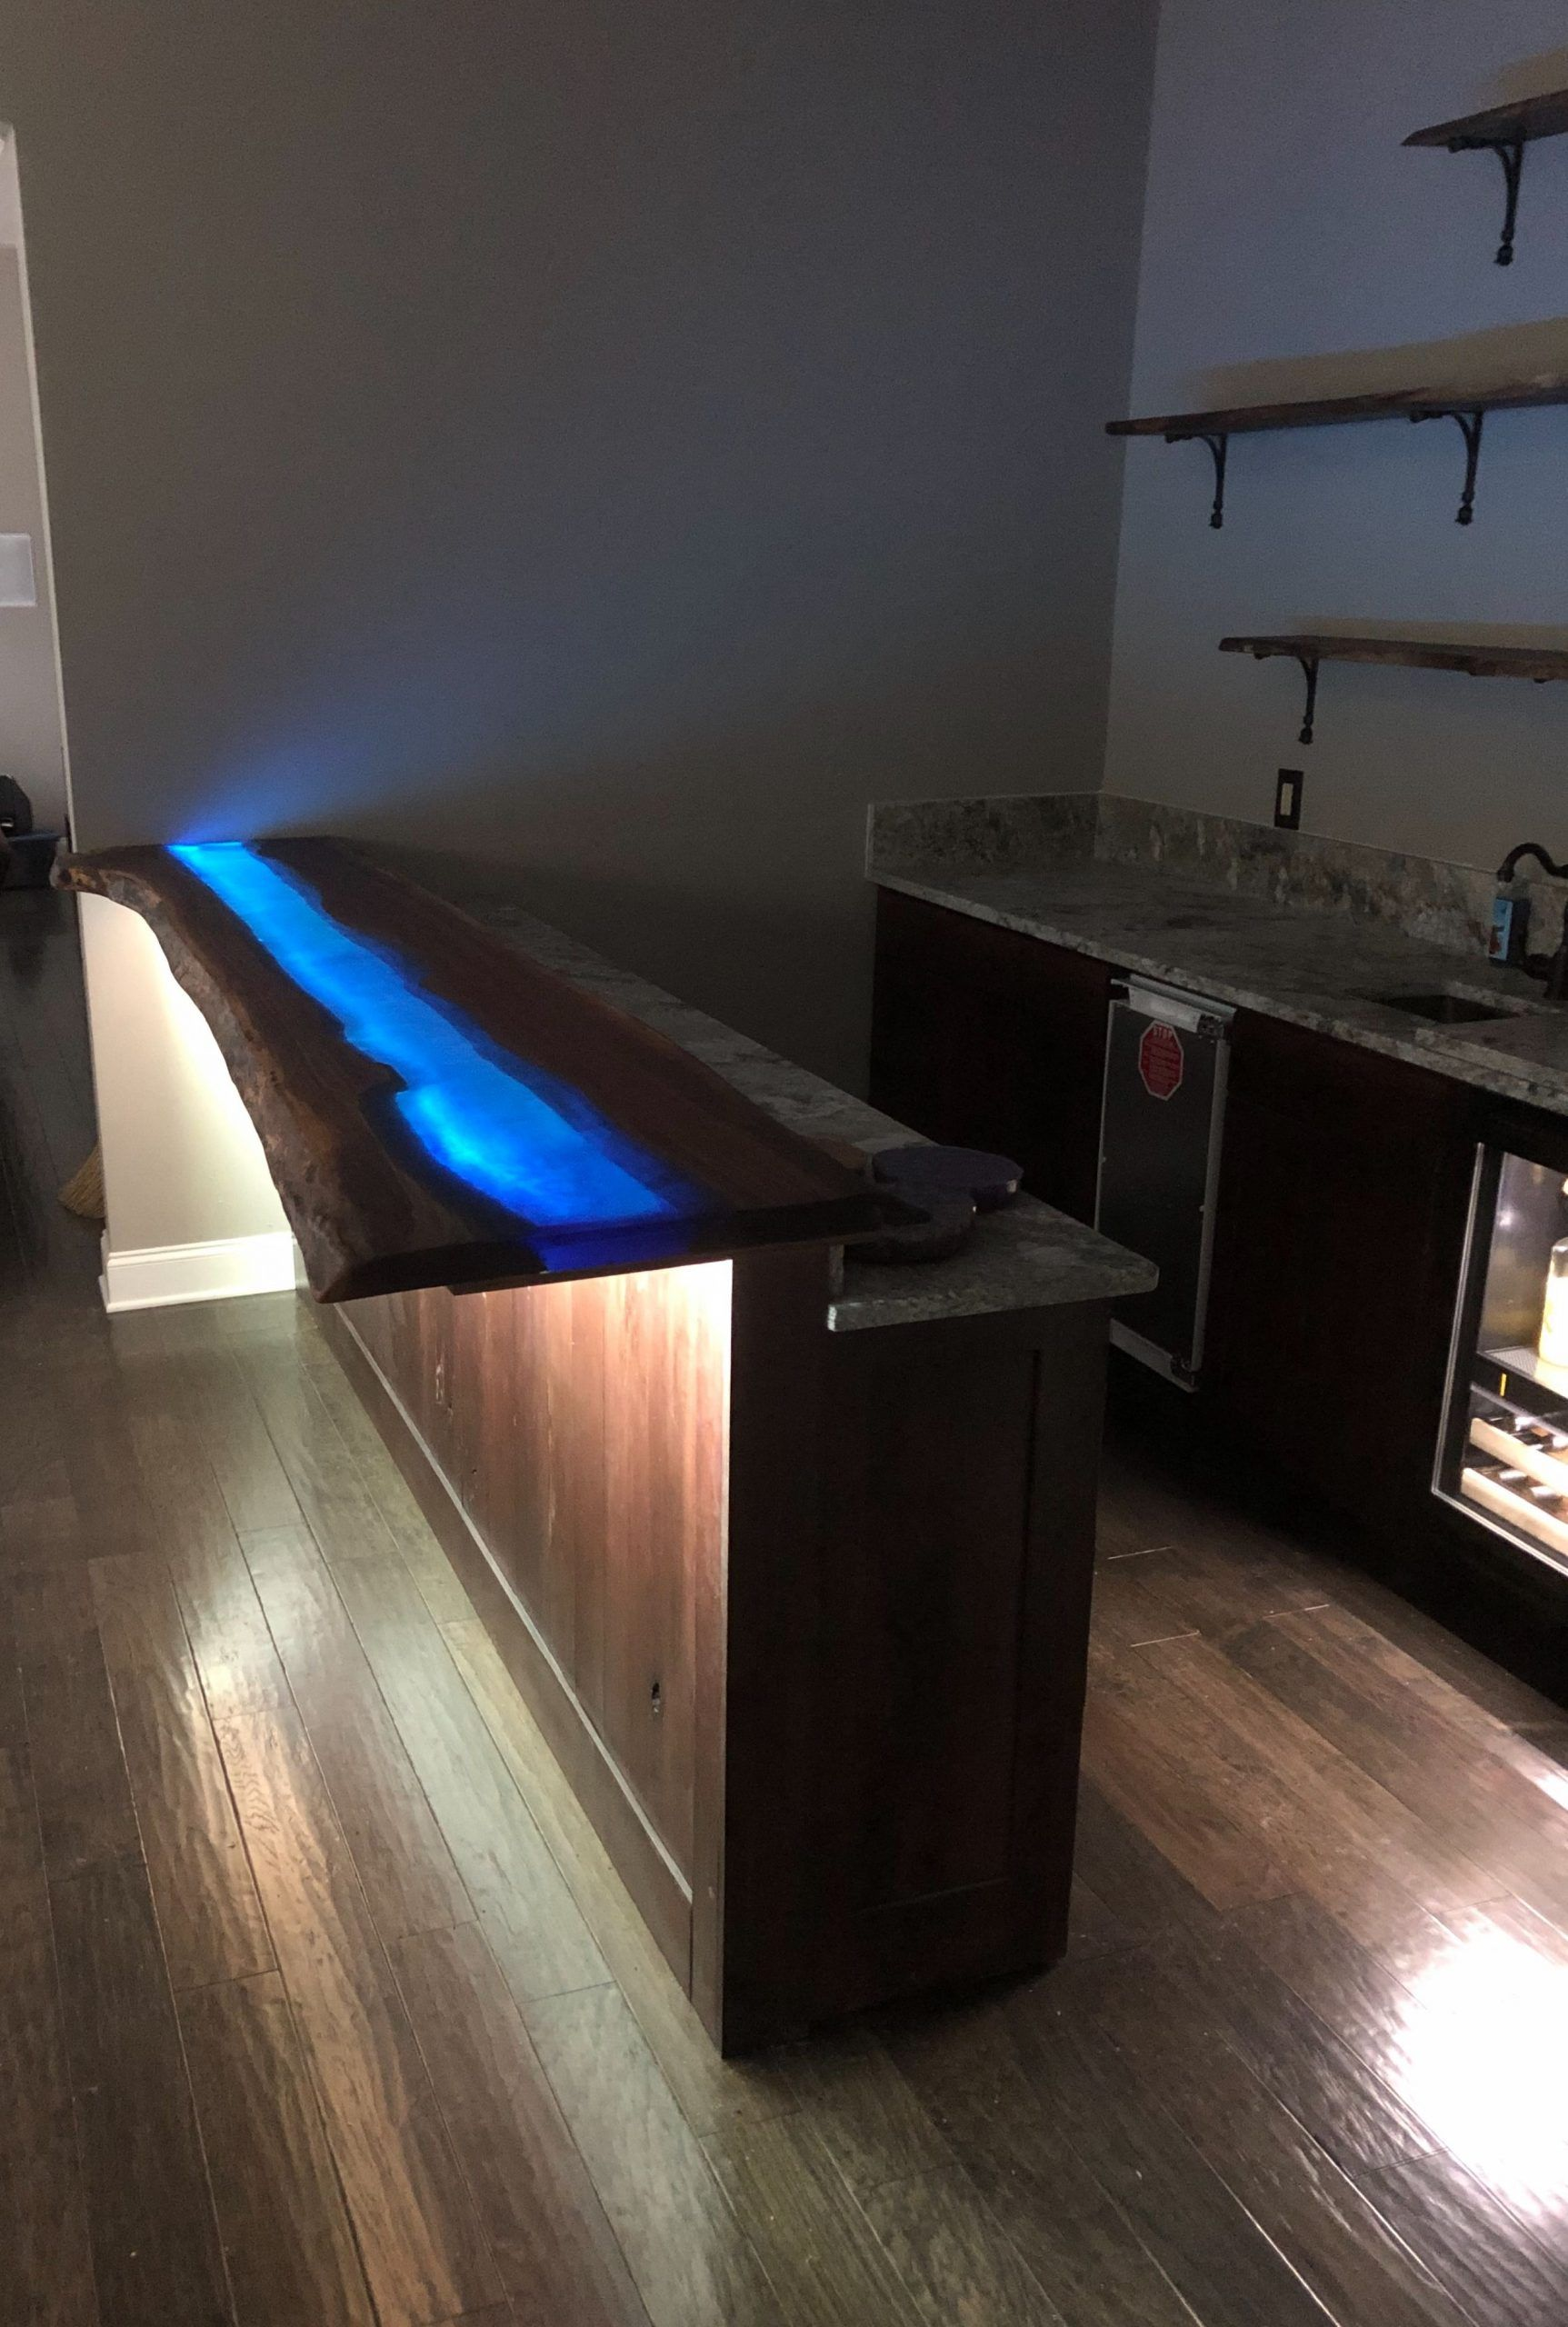 Led Lichtleiste Unter Dem Blauen Epoxidharzfluss Installiert Blauen Dem Epoxidharzfluss Installiert In 2020 Strip Lighting Live Edge Countertop Led Strip Lighting